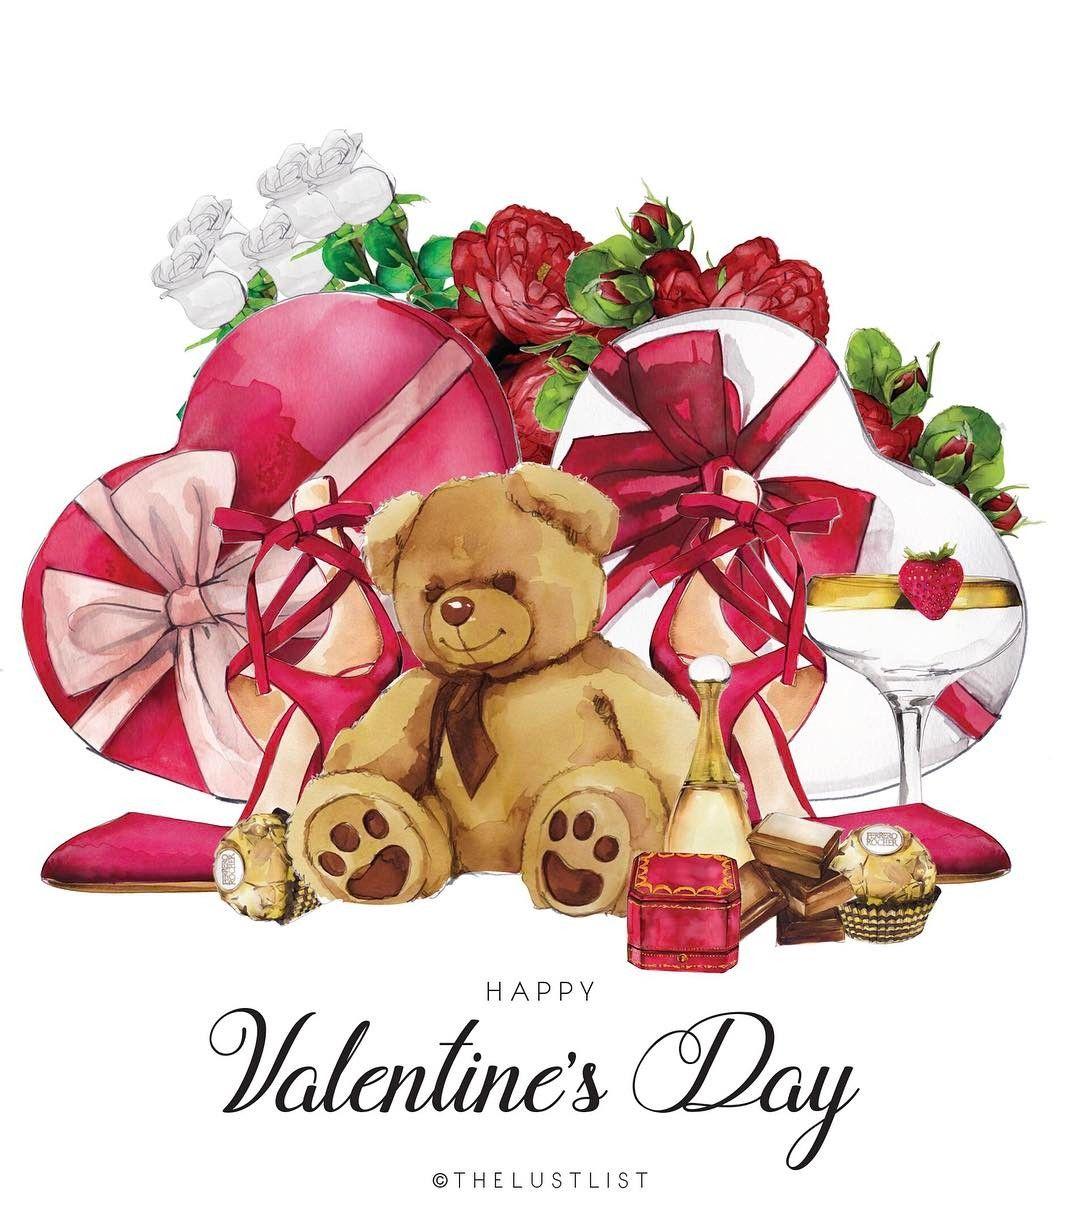 HAPPY VALENTINES DAY! #thelustlist #valentinesday #love